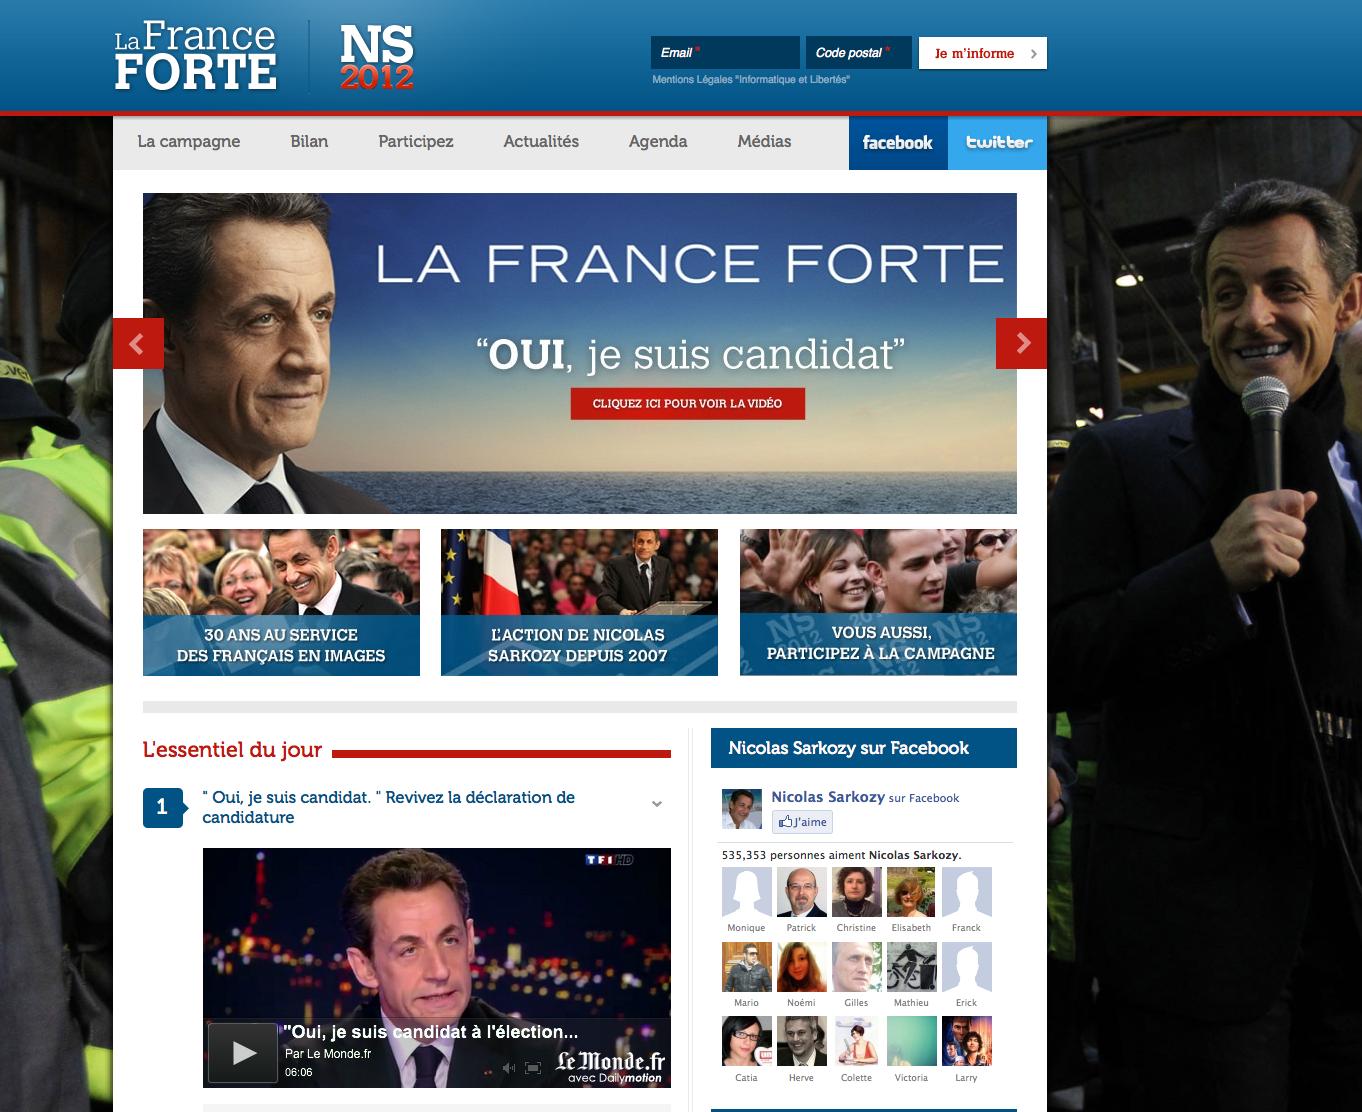 Site Web du candidat Nicolas Sarkozy - UMP